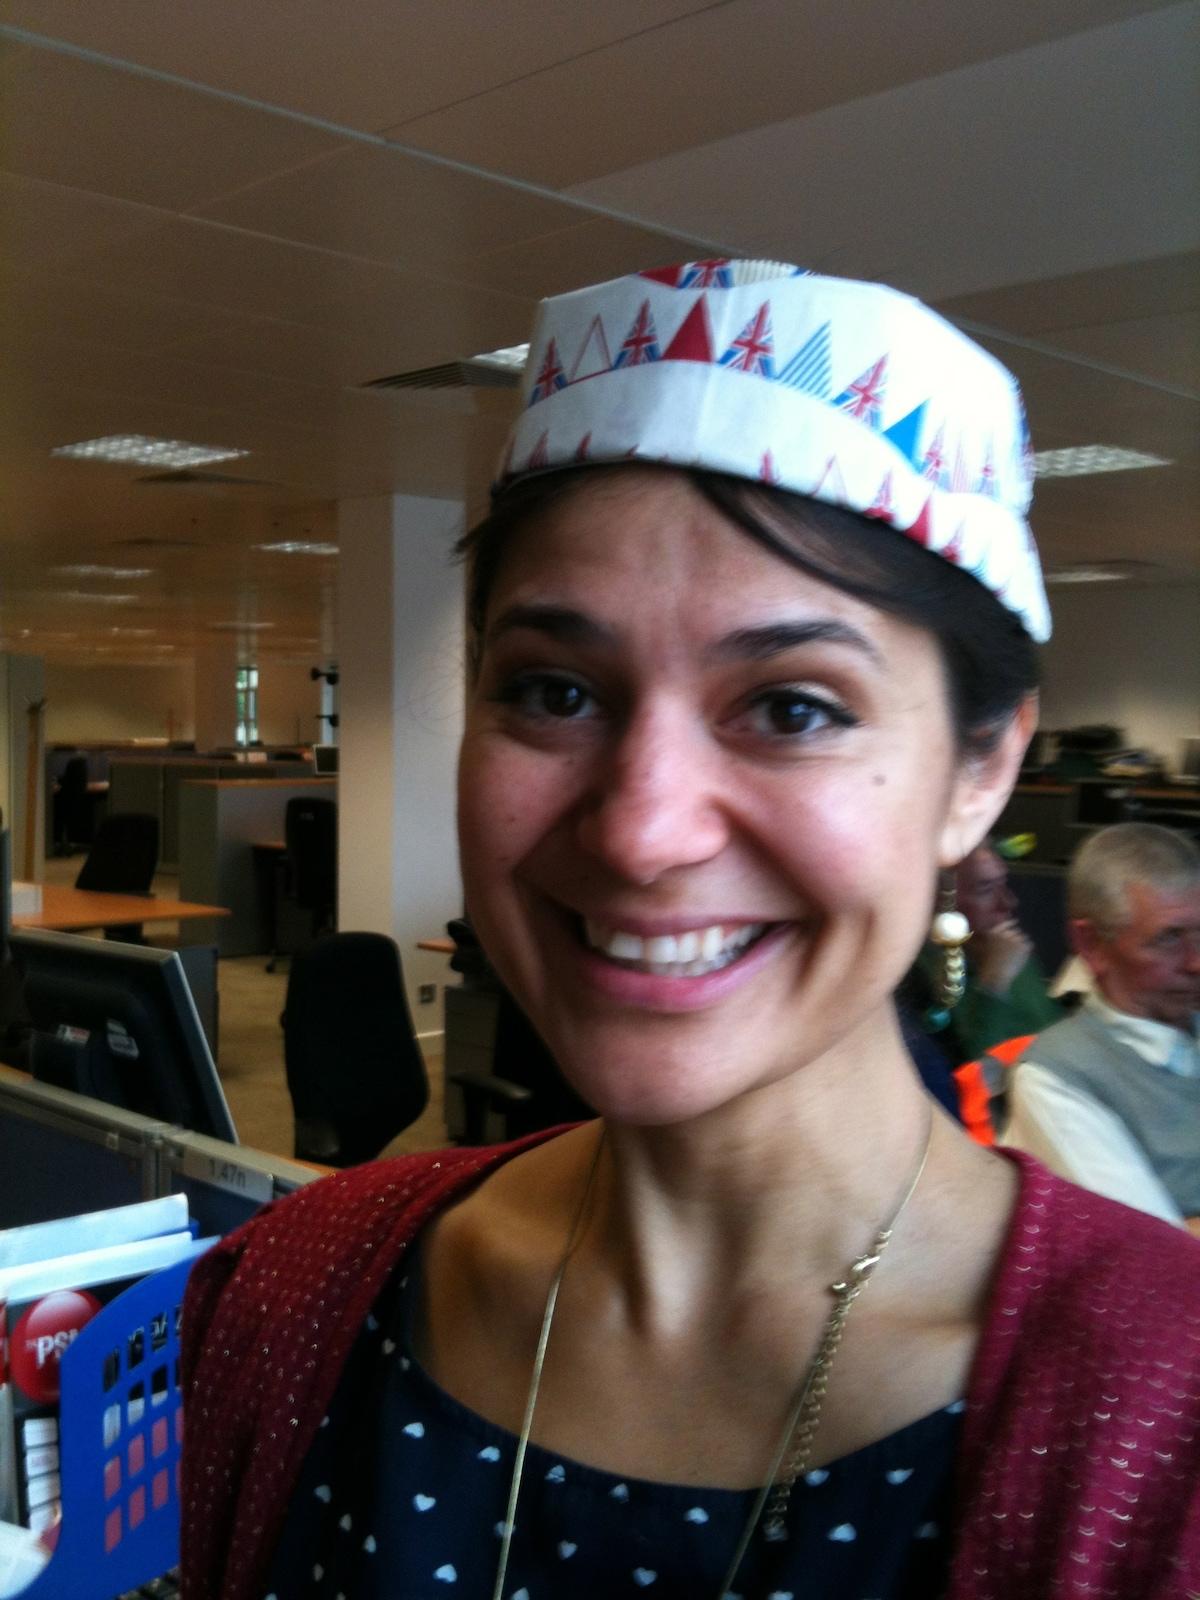 Gita from London